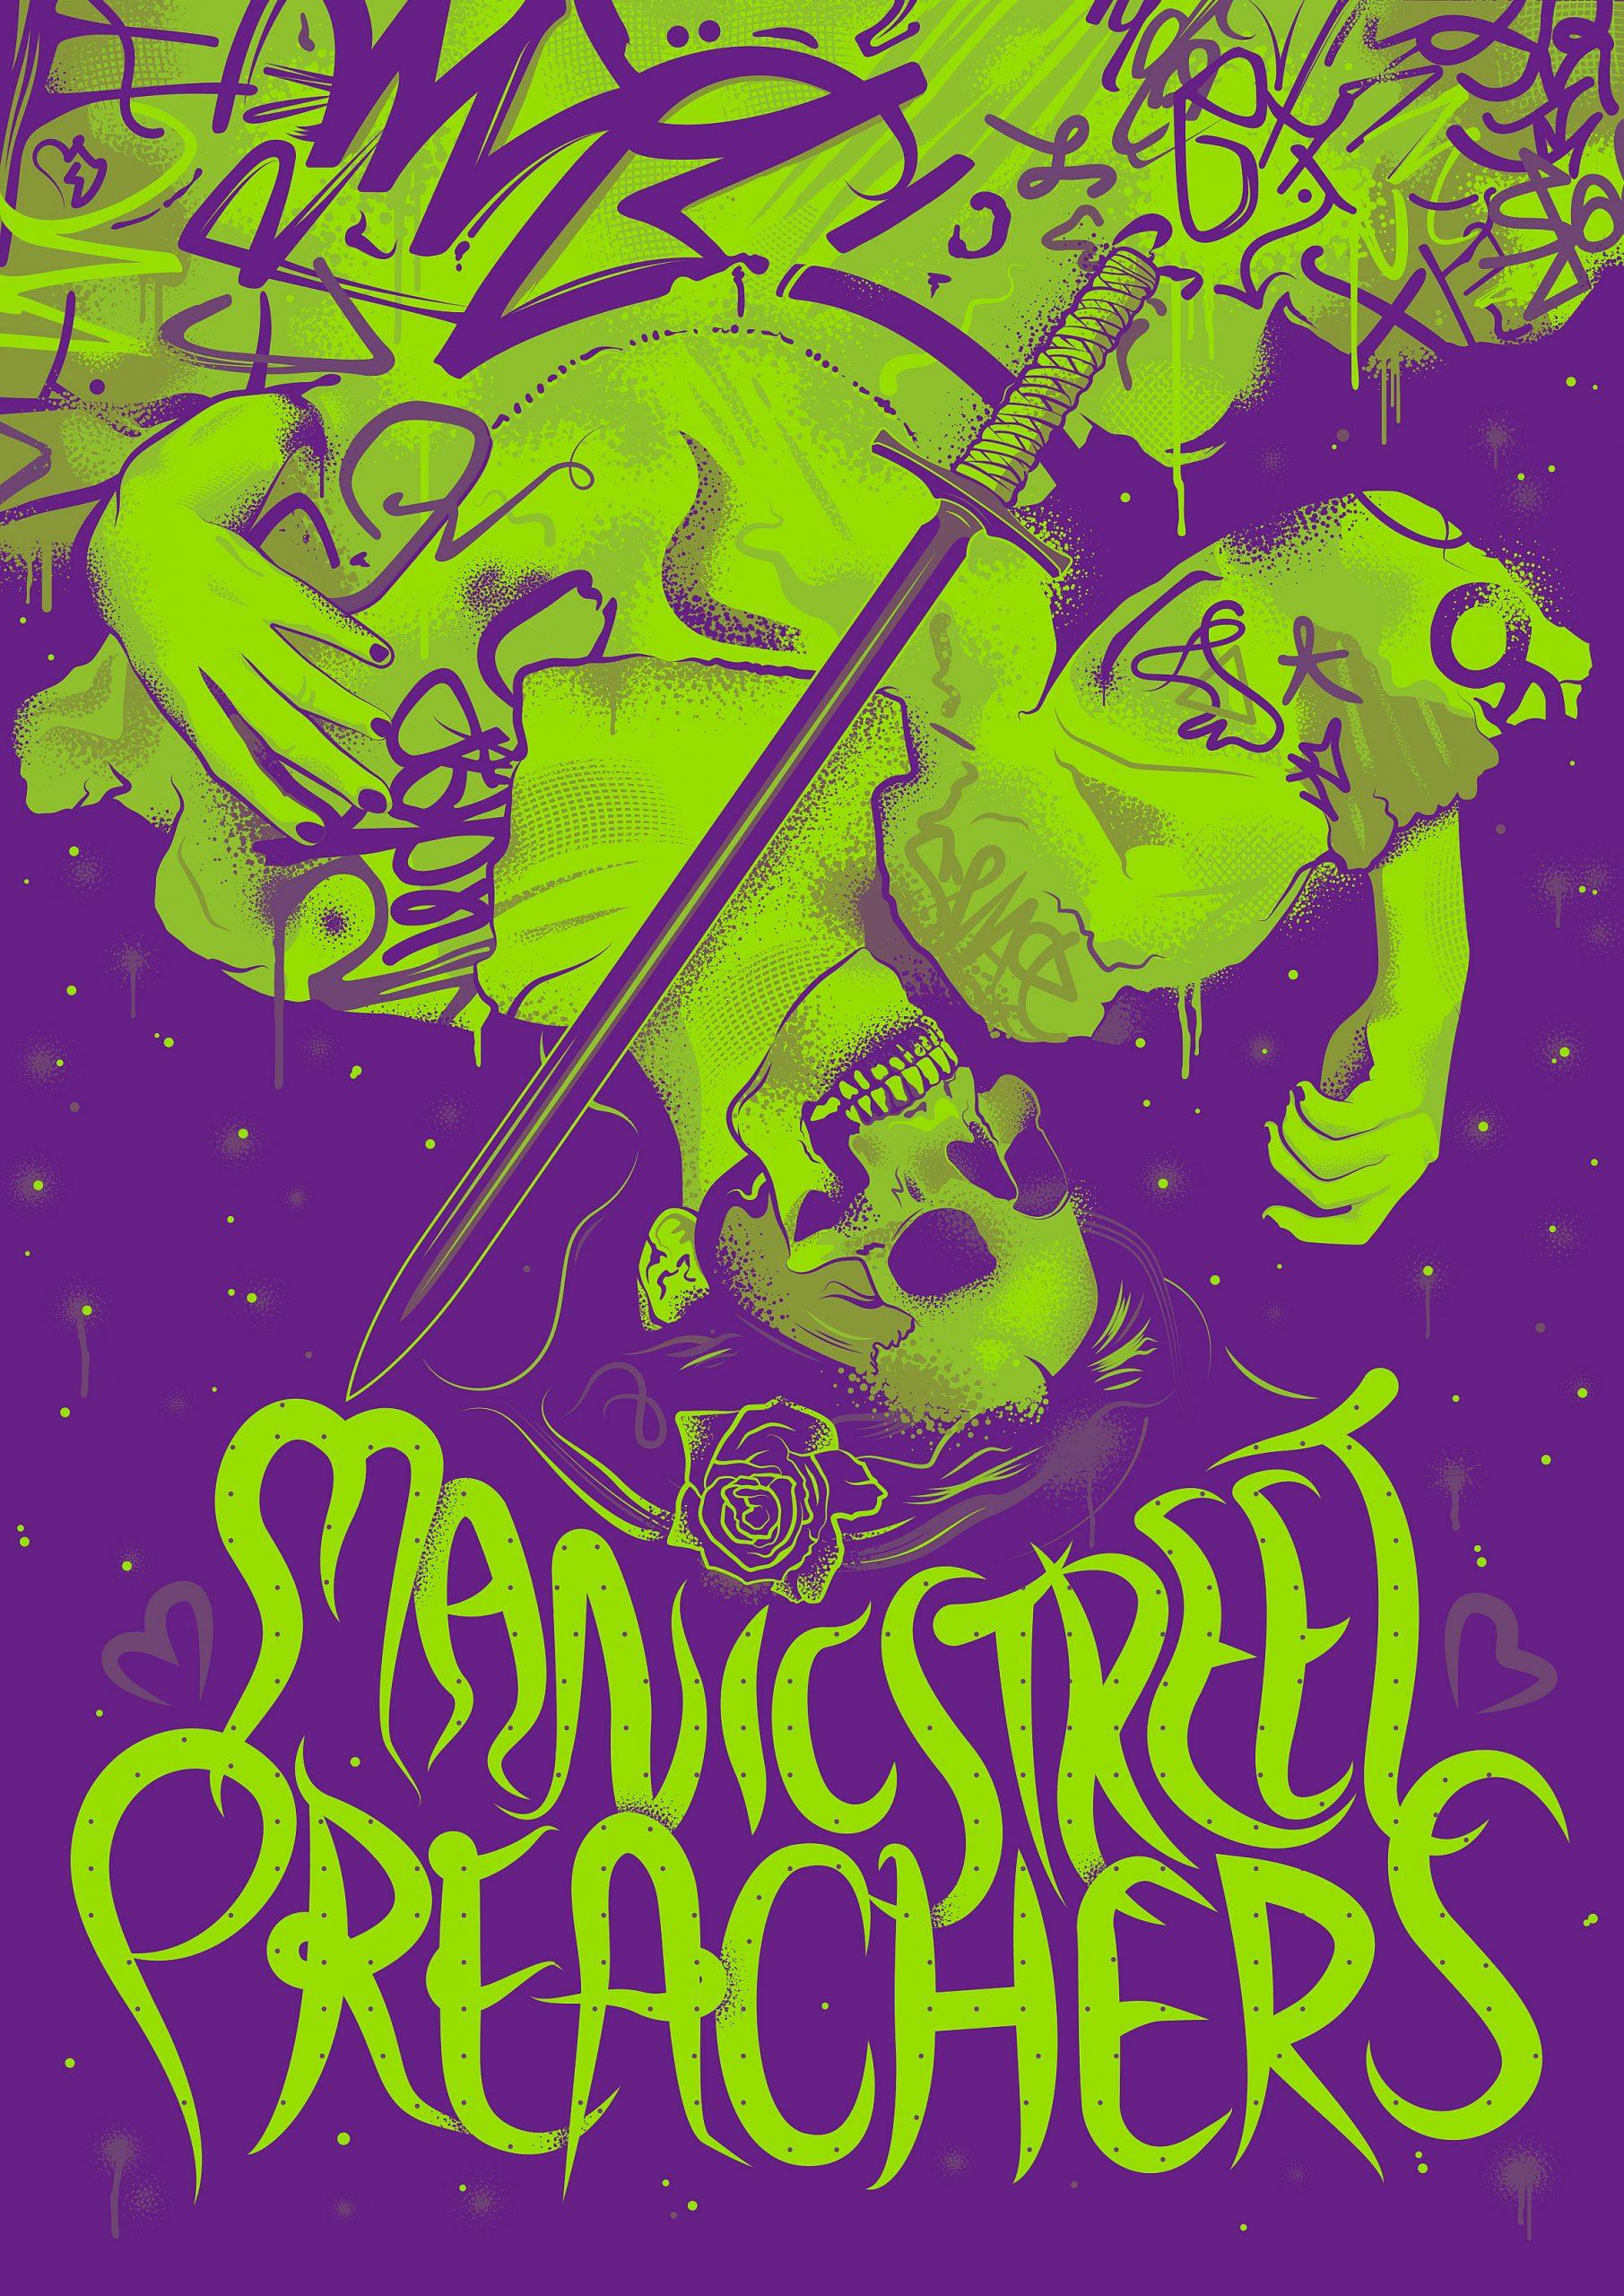 Manic Street Preachers Alternative Gig Poster 2